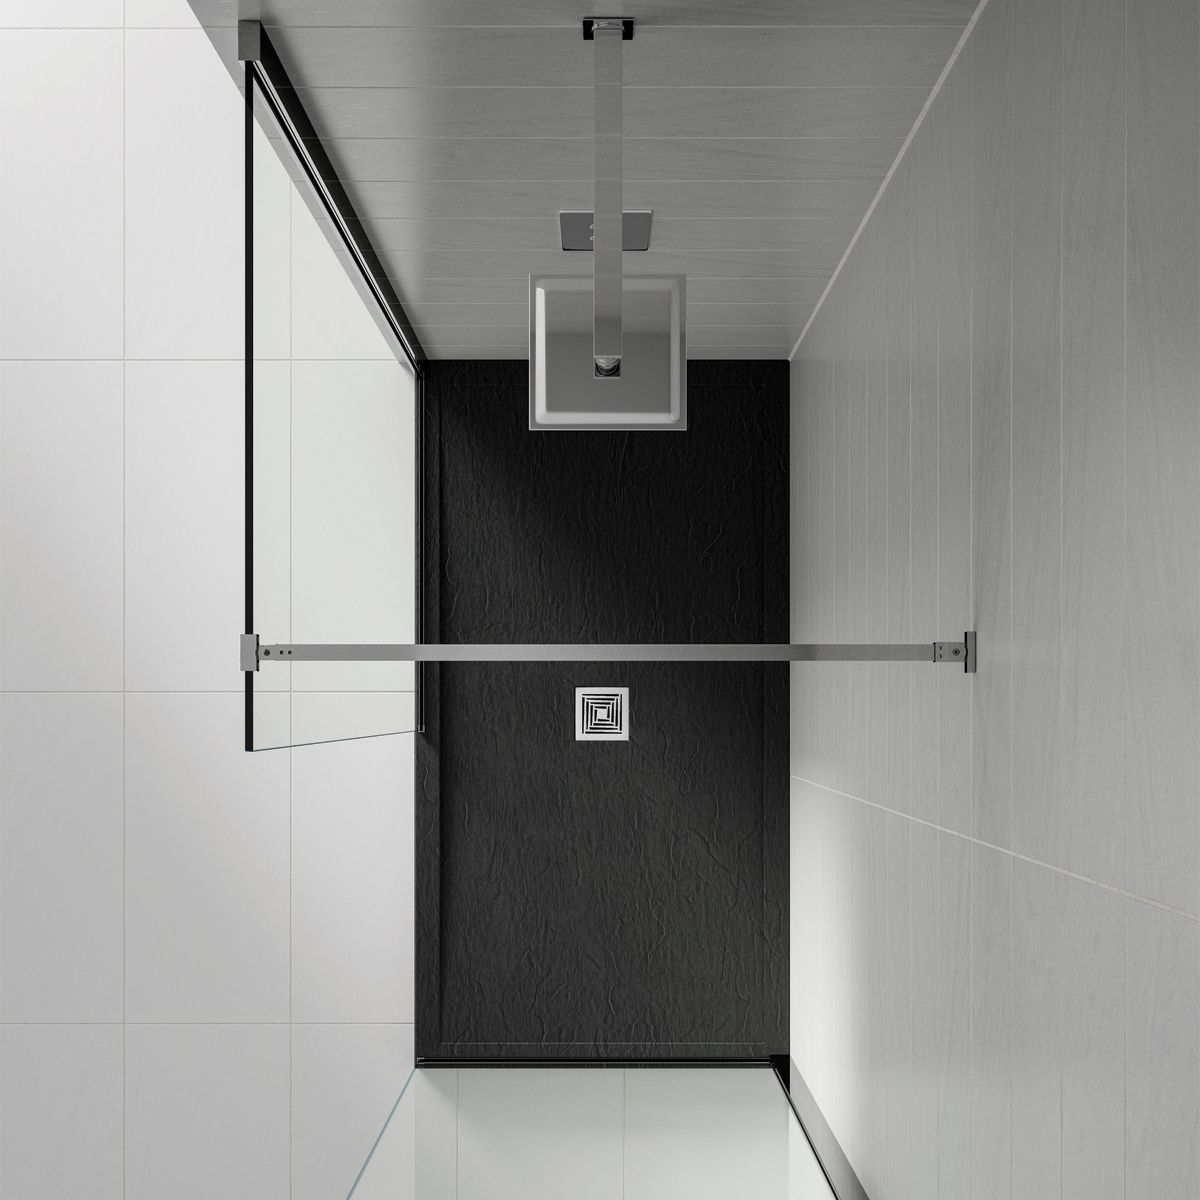 Aquadart Black Slate Shower Tray 1200 x 900 Overhead